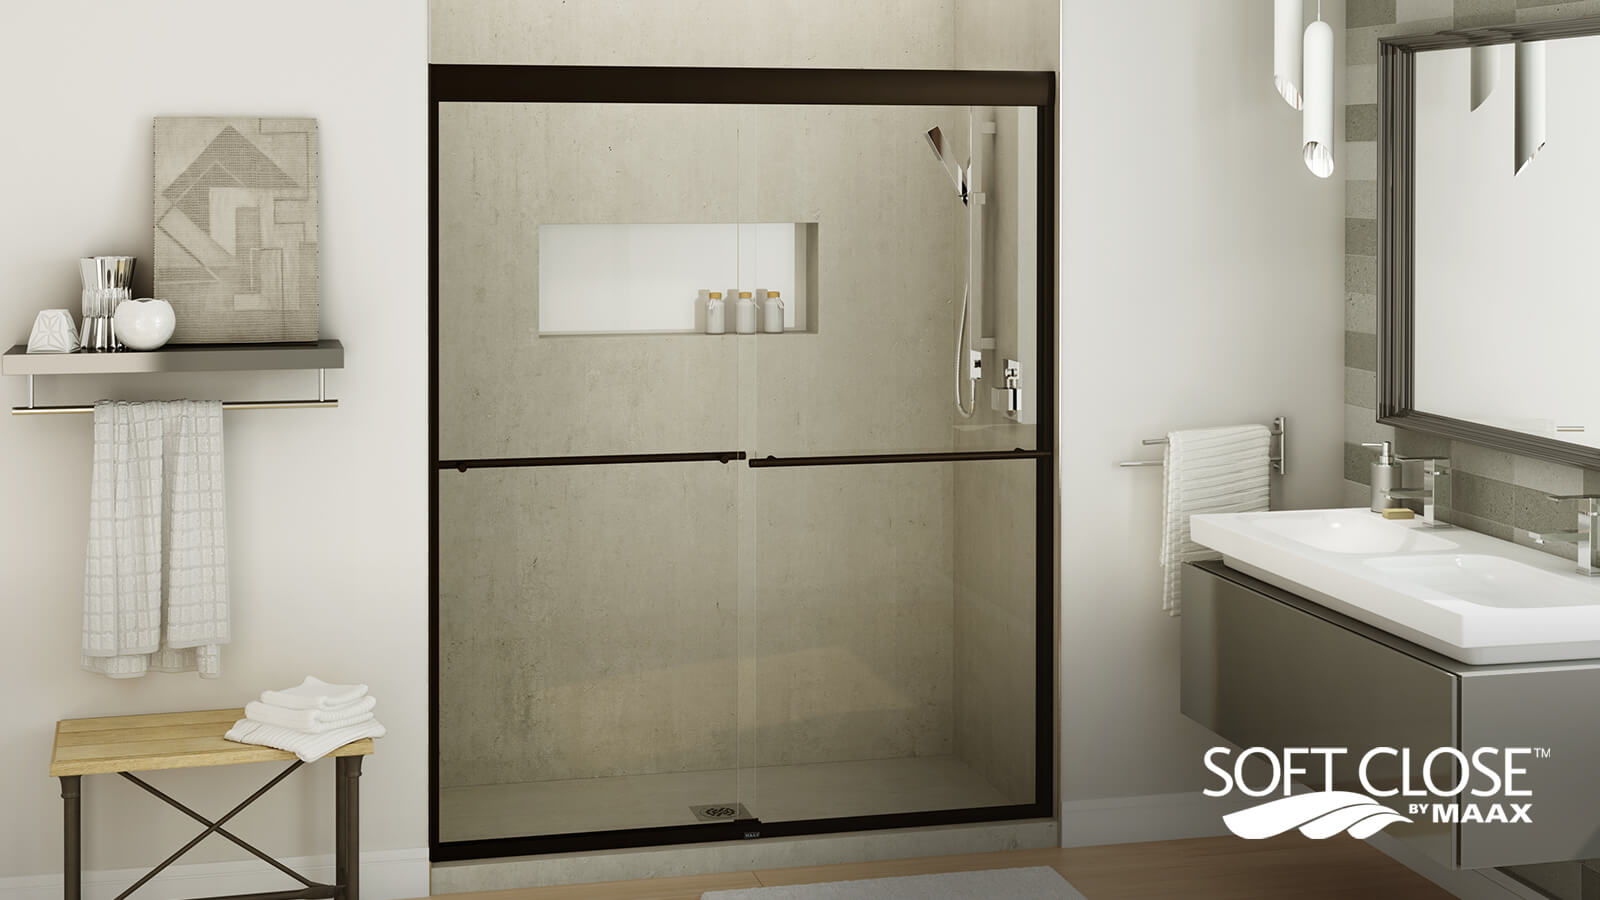 MAAX Soft Close Door Innovation